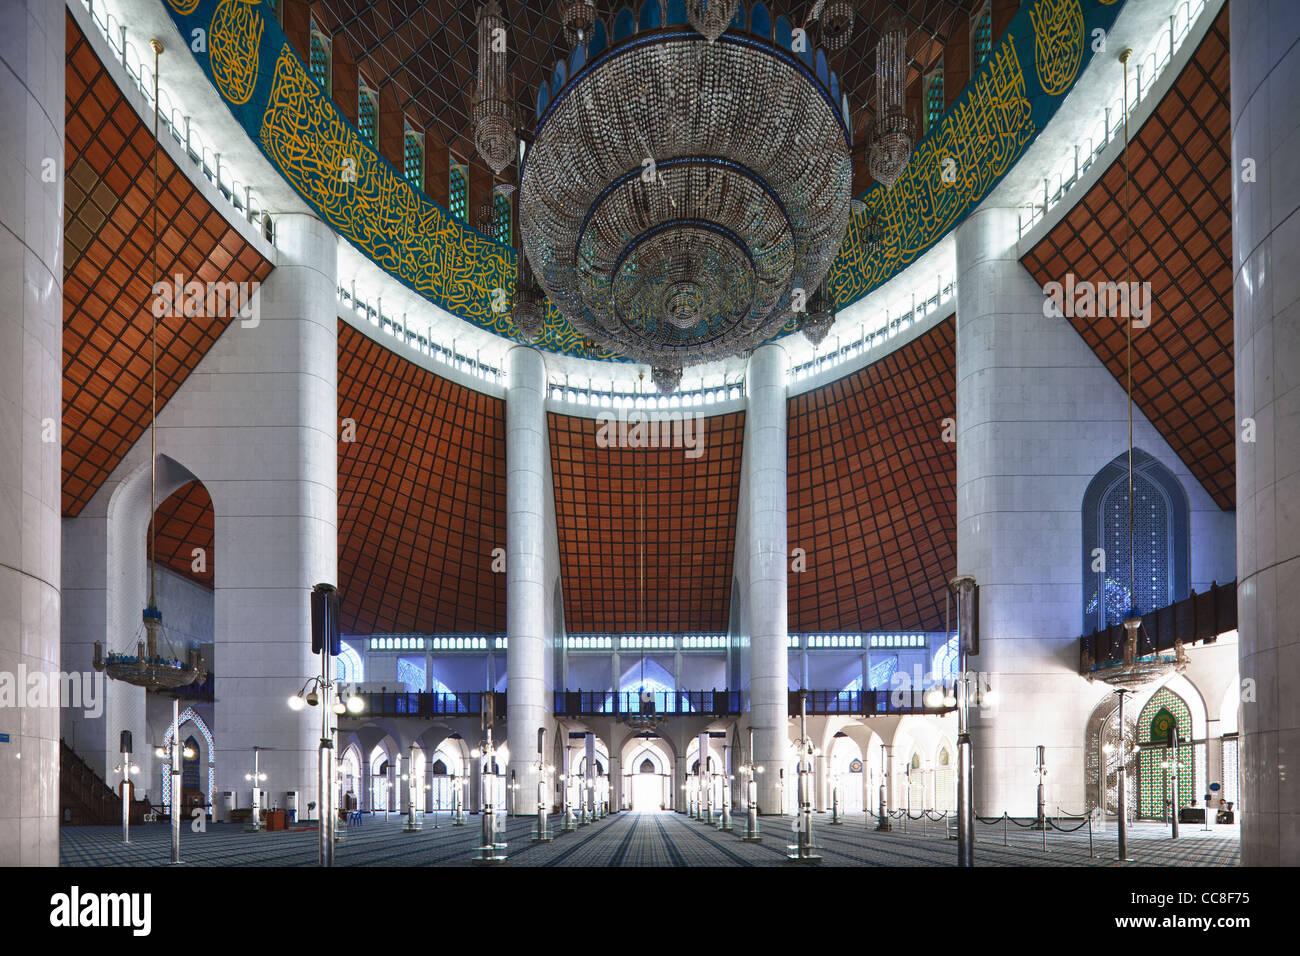 Masjid Sultan Salahuddin Abdul Aziz Shah Shah Alam Malaysia Stock Photo Alamy